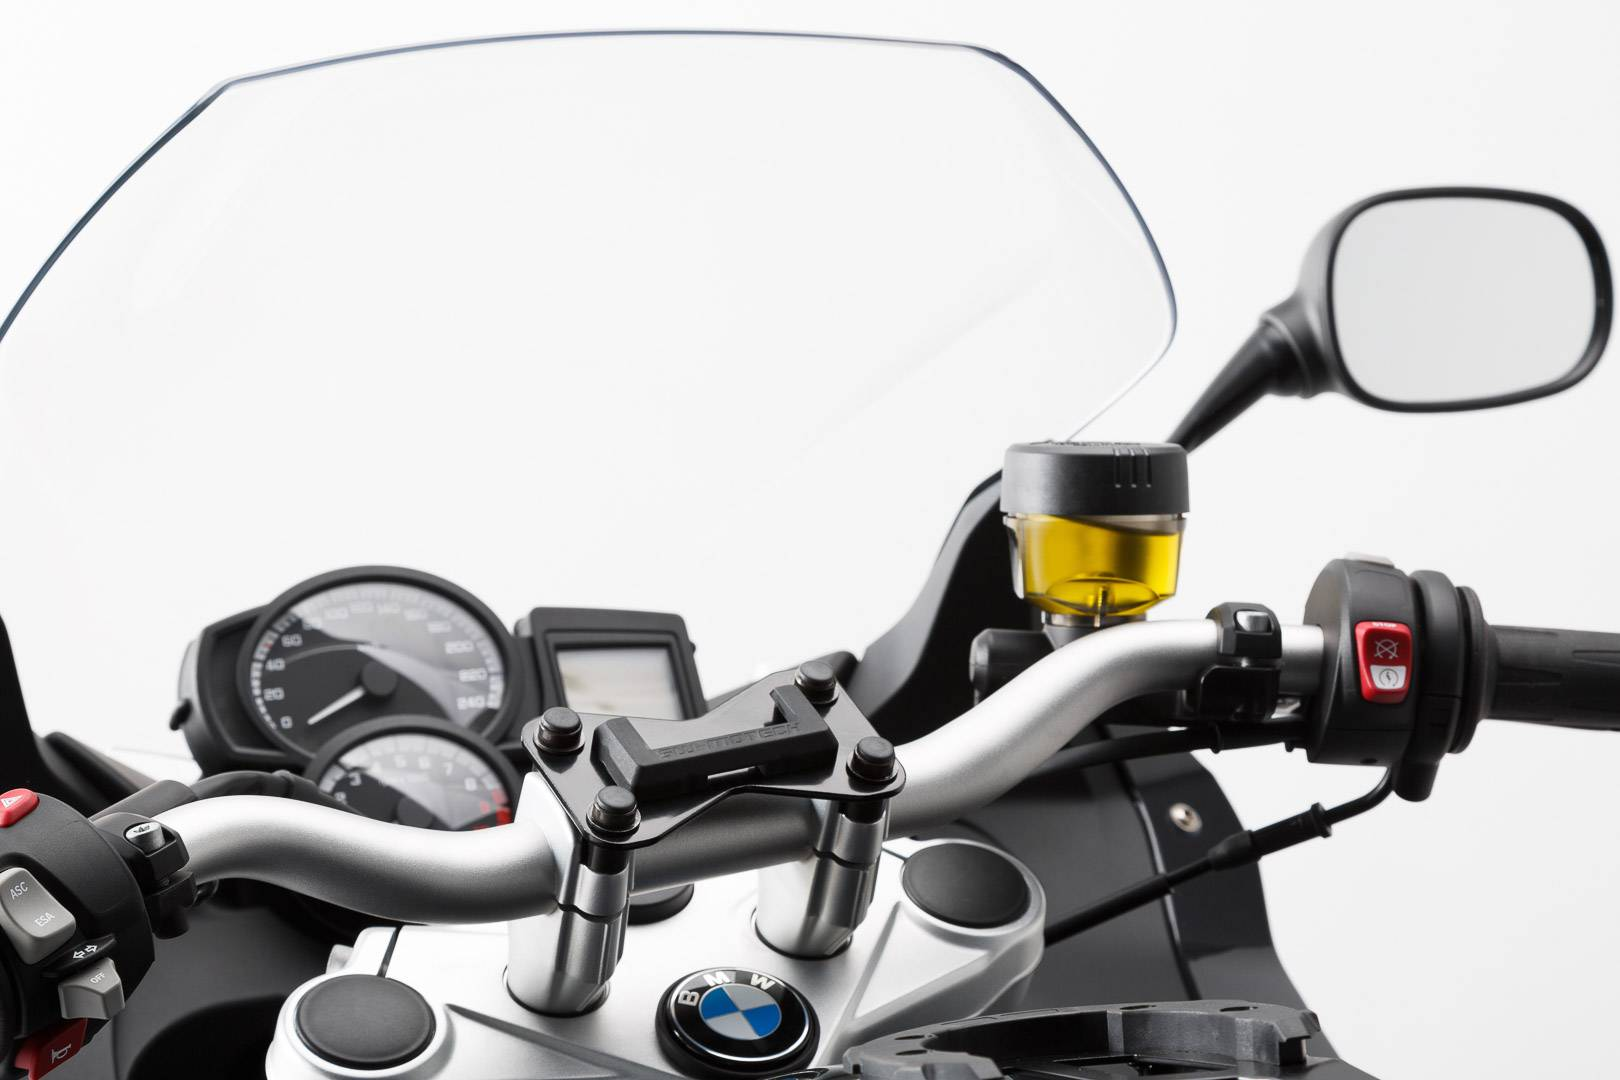 SW-Motech Navi-Halter am Lenker - Schwarz. BMW F800R, F800GT, Husqvarna TR650. schwarz